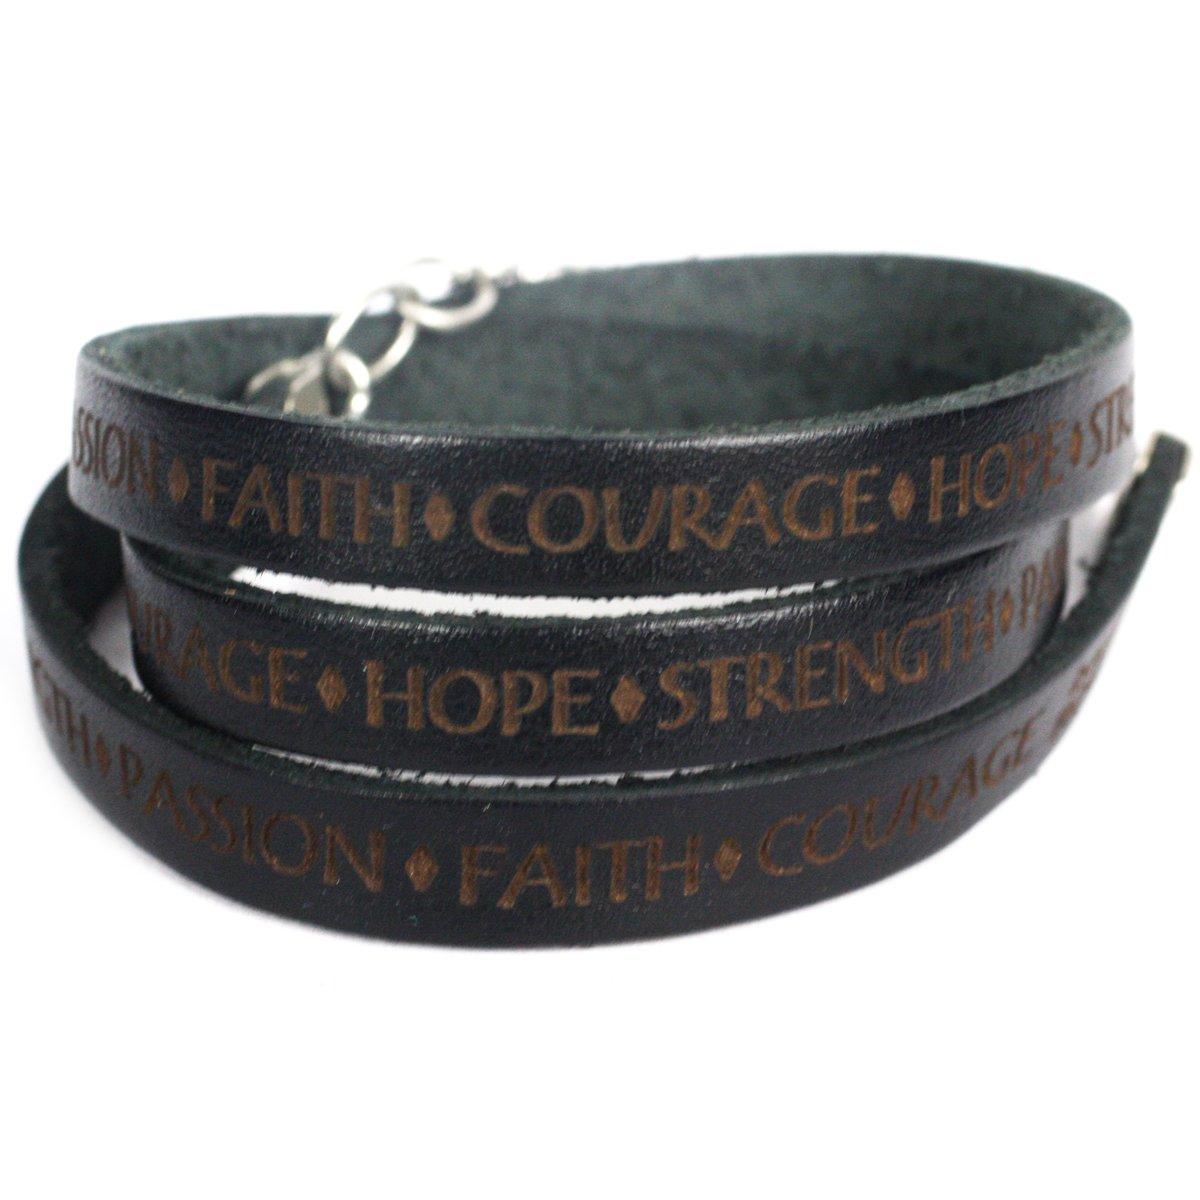 Faith Courage Hope Strength Passion Leather Wrap Bracelet - Black Dillon Rogers WRP-217-BLK